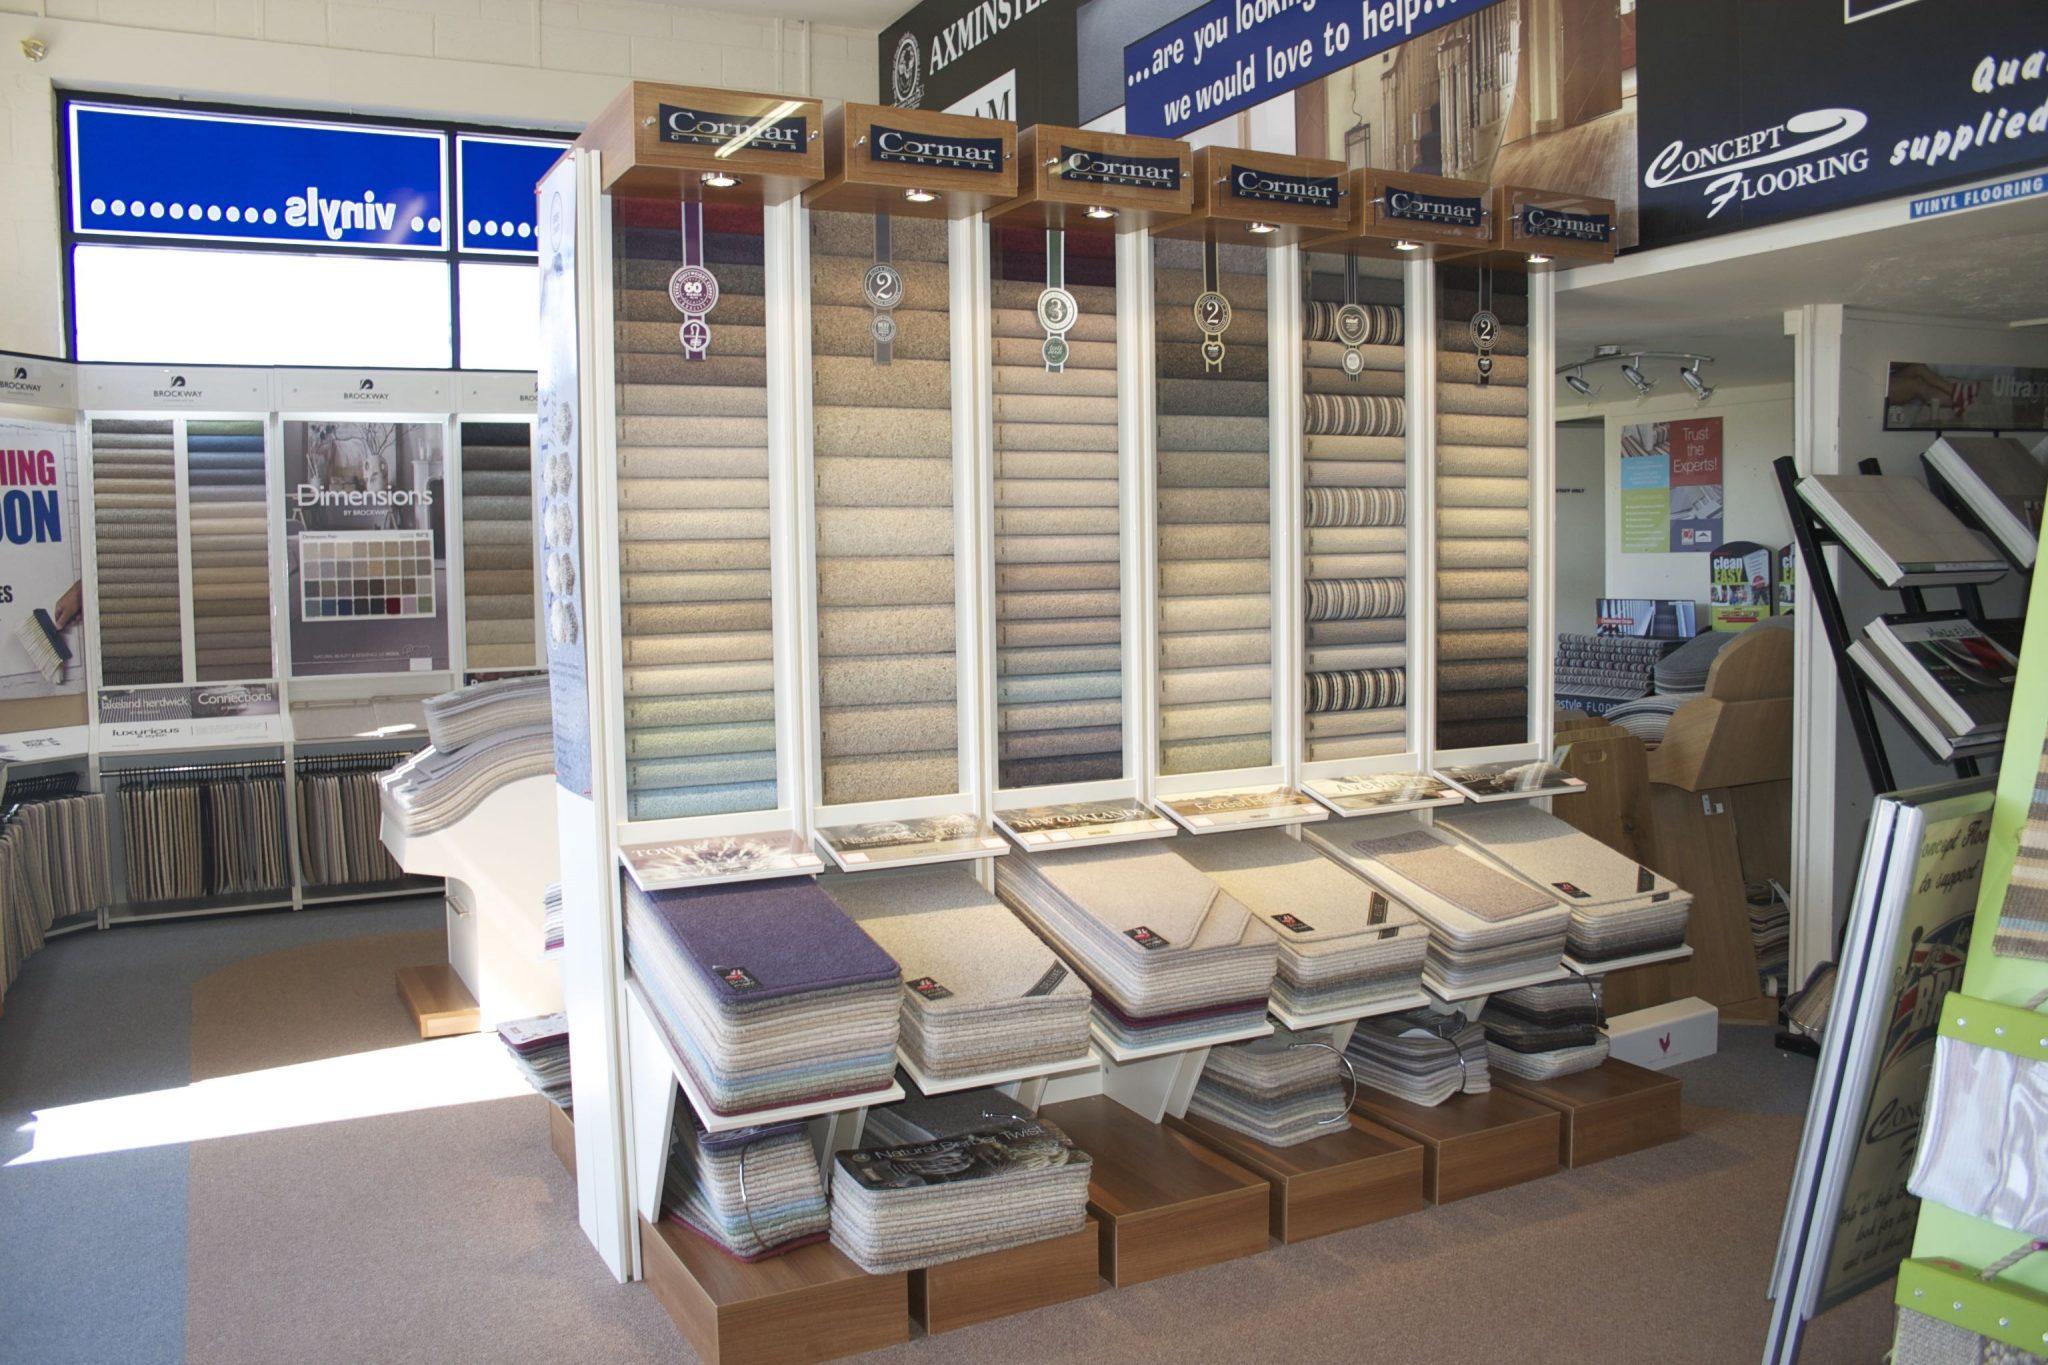 Concept flooring carpets karndean cushion flooring tiles for Franks flooring